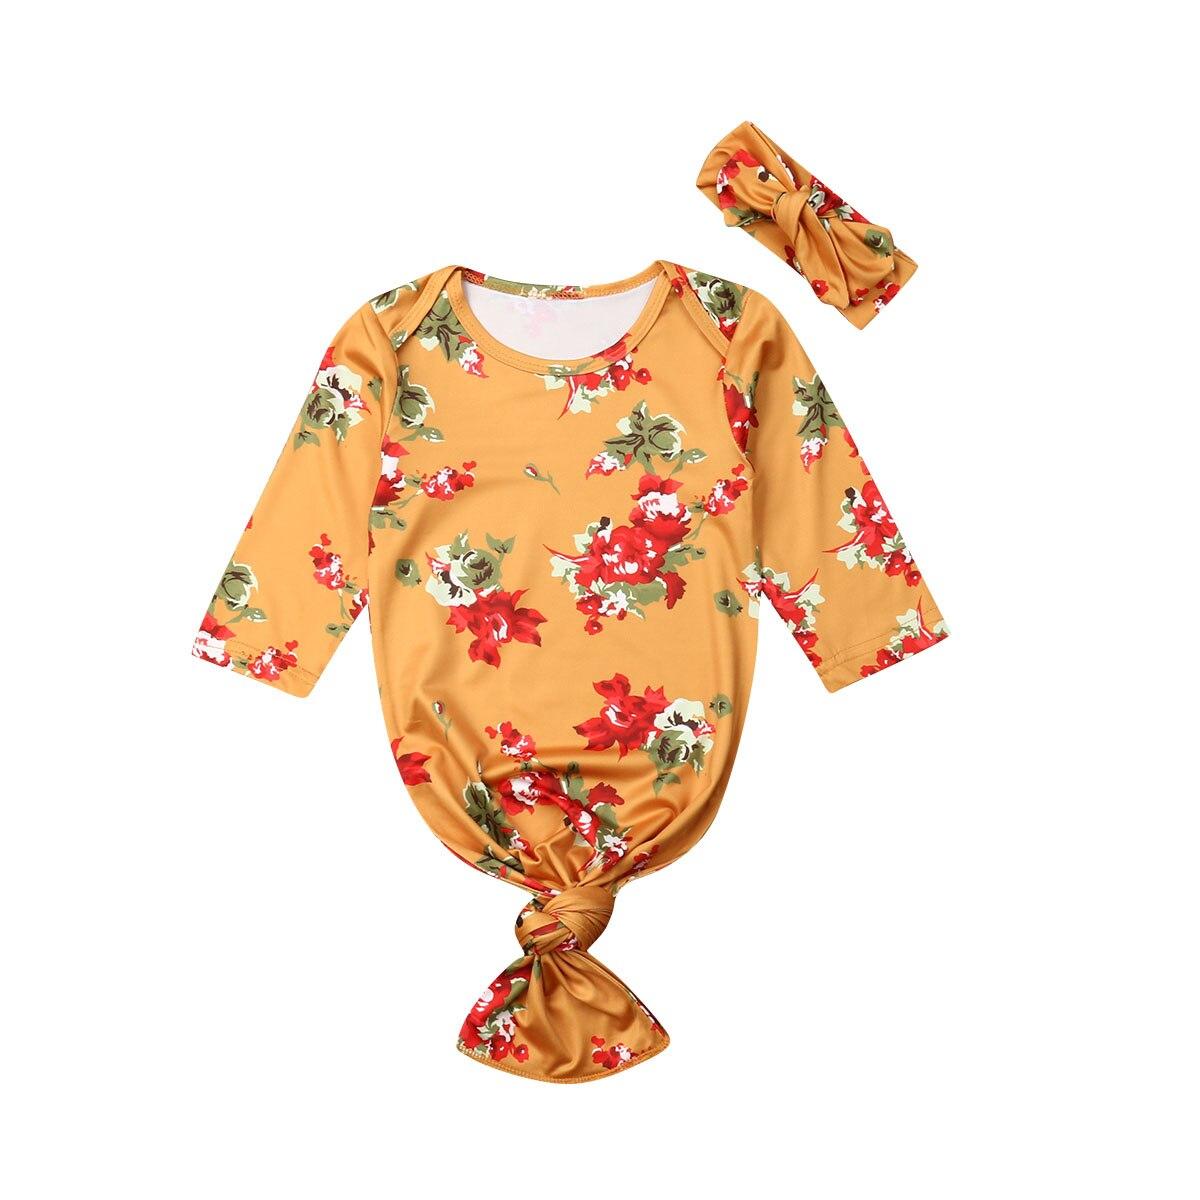 îTop SaleBlanket Swaddle-Wrap Sleeping-Bags Long-Sleeve Newborn Infant Baby Cotton 2pcs-Sets Headband